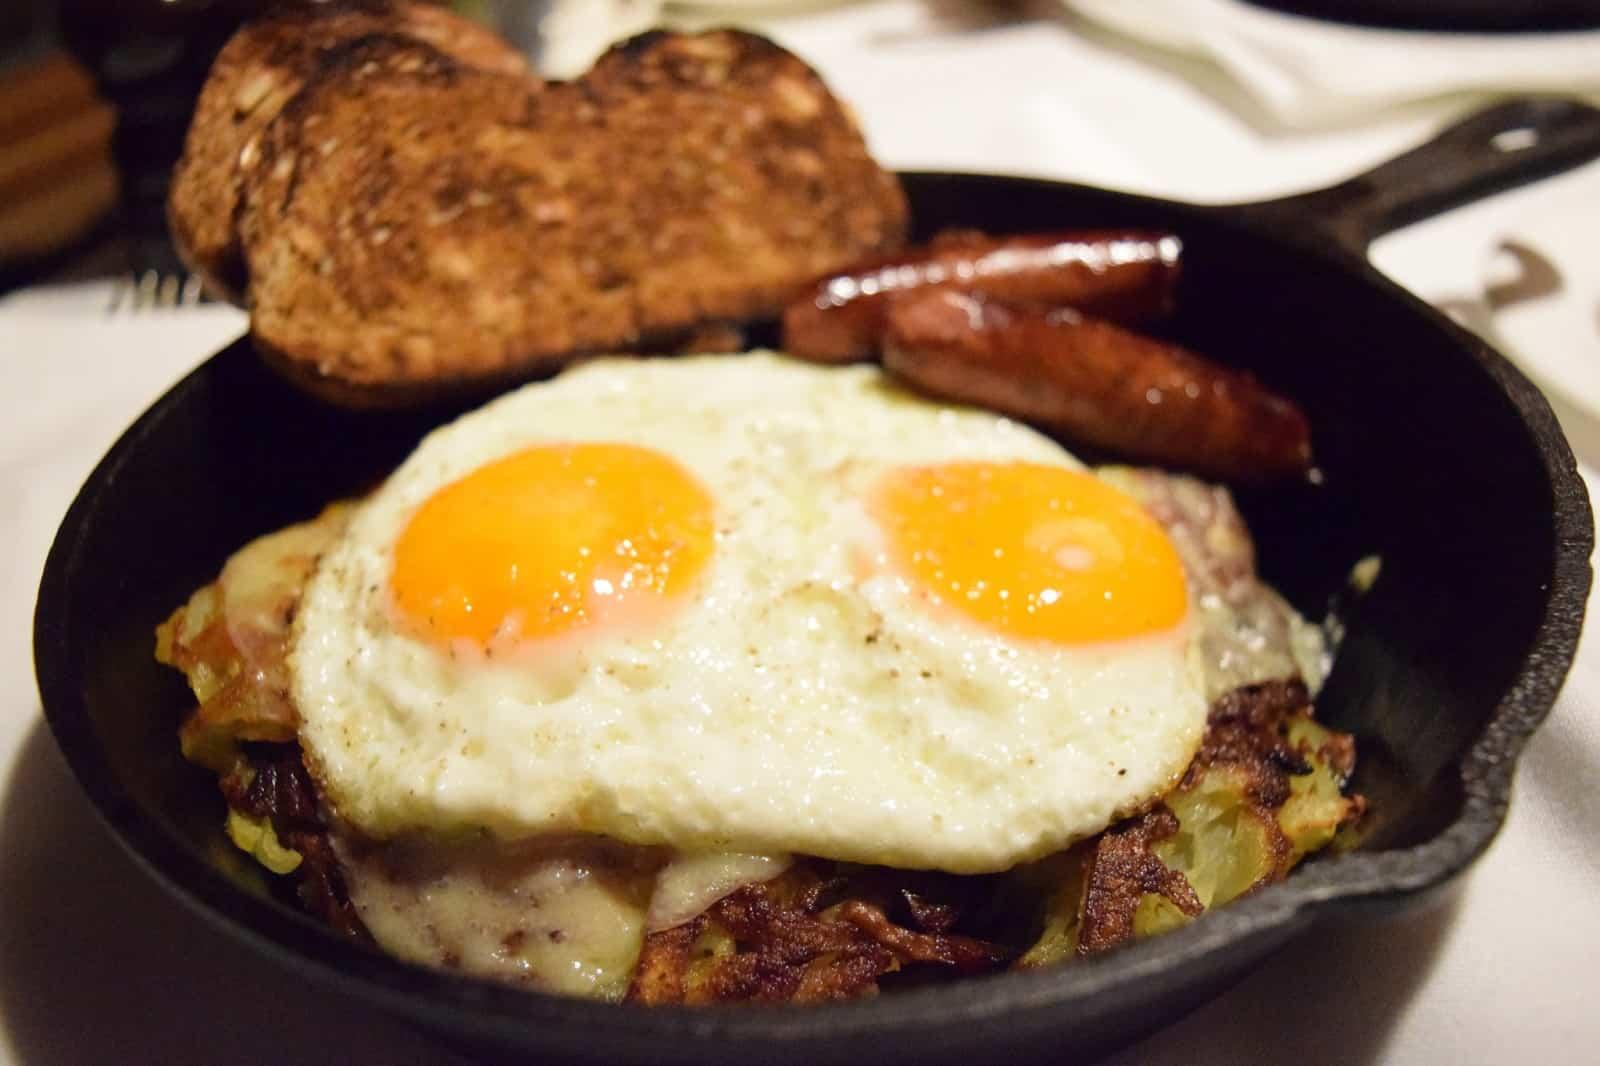 Rosti Breakfast brings comfort food to Banff Banff in winter